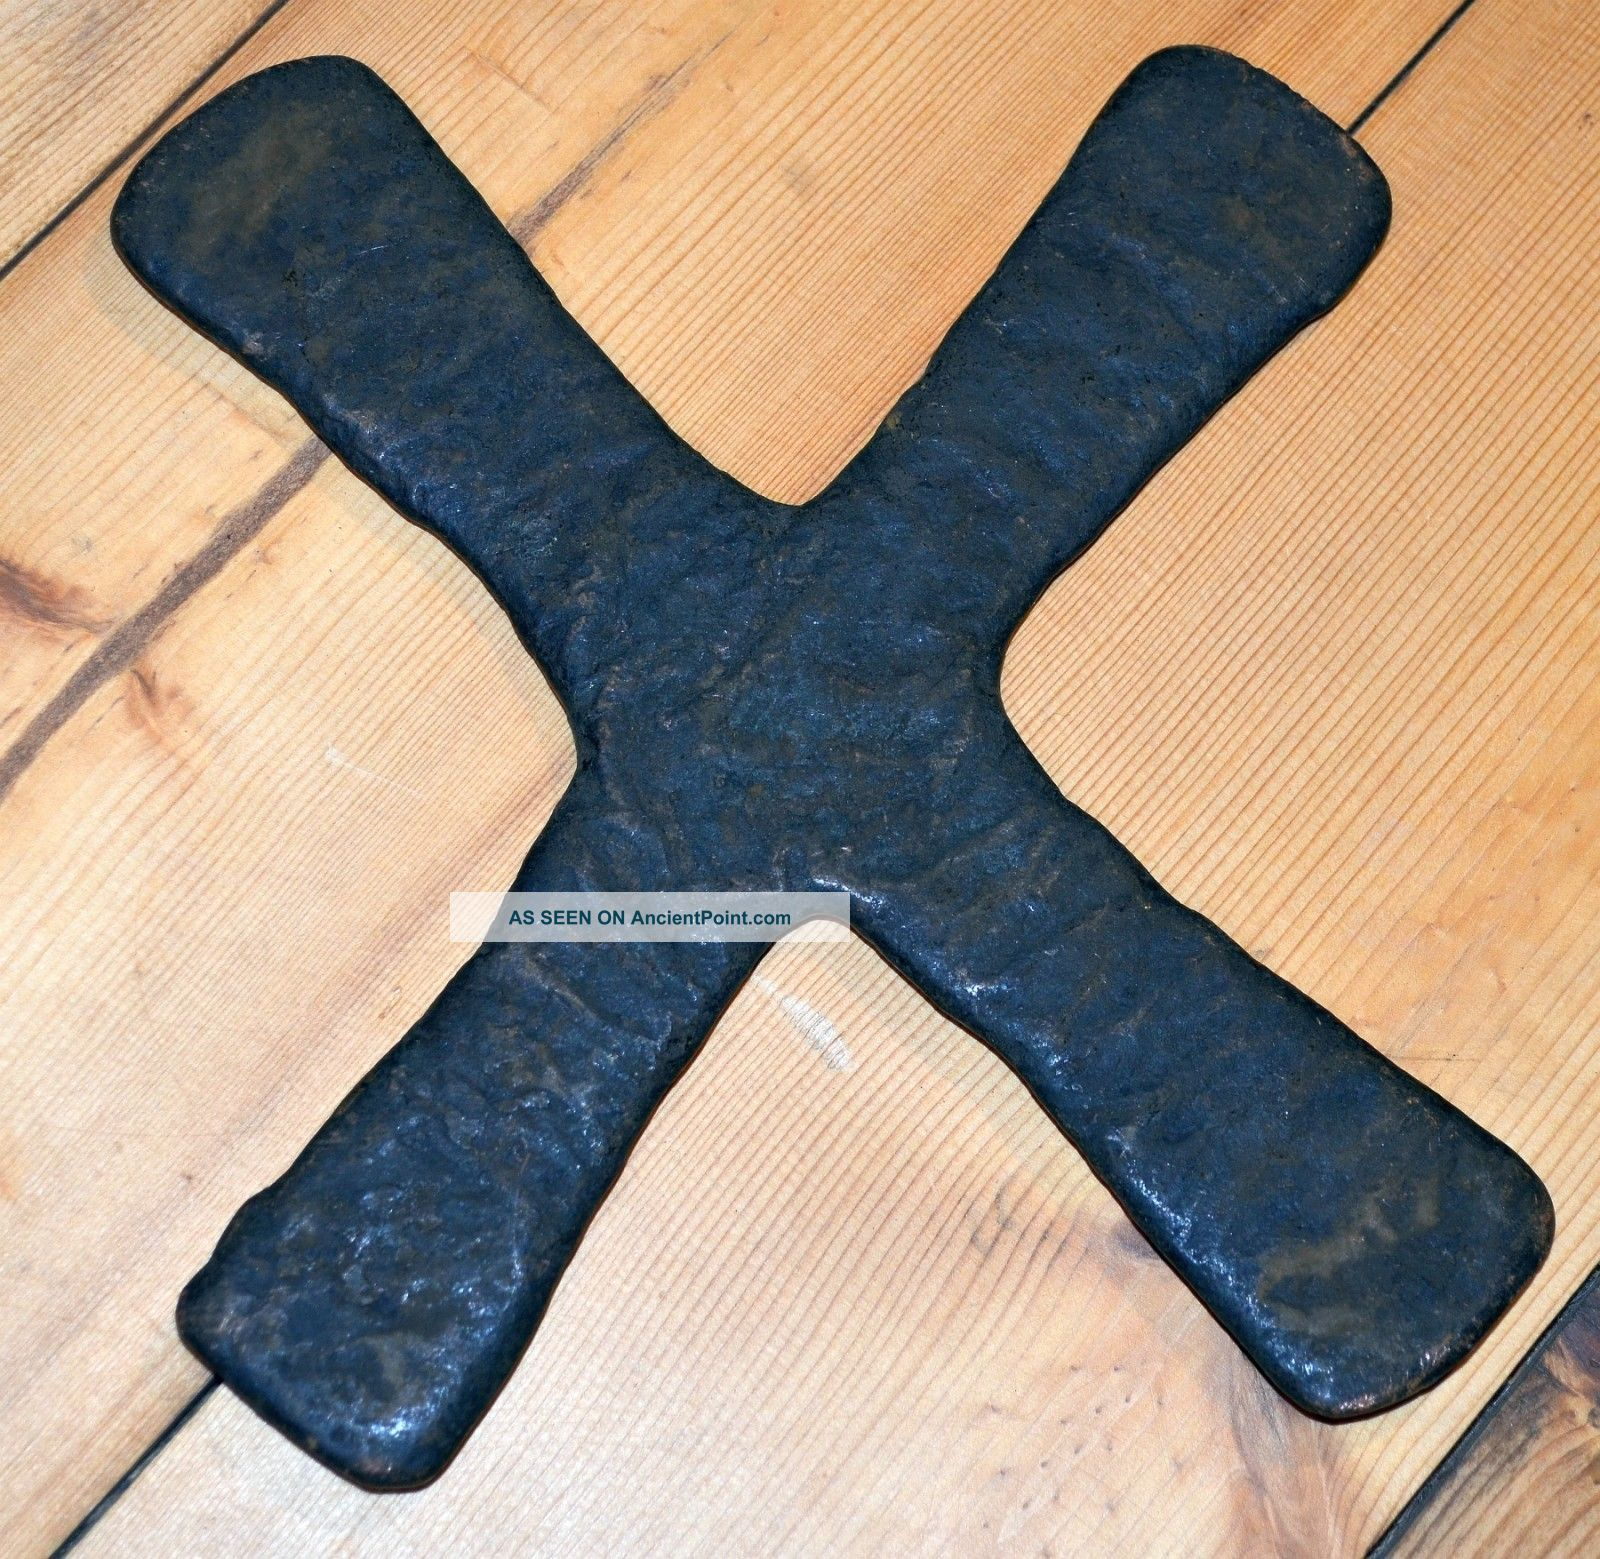 Antique Katanga Cross Currency X Shaped Cast Copper Ingot Congo,  Africa Sculptures & Statues photo